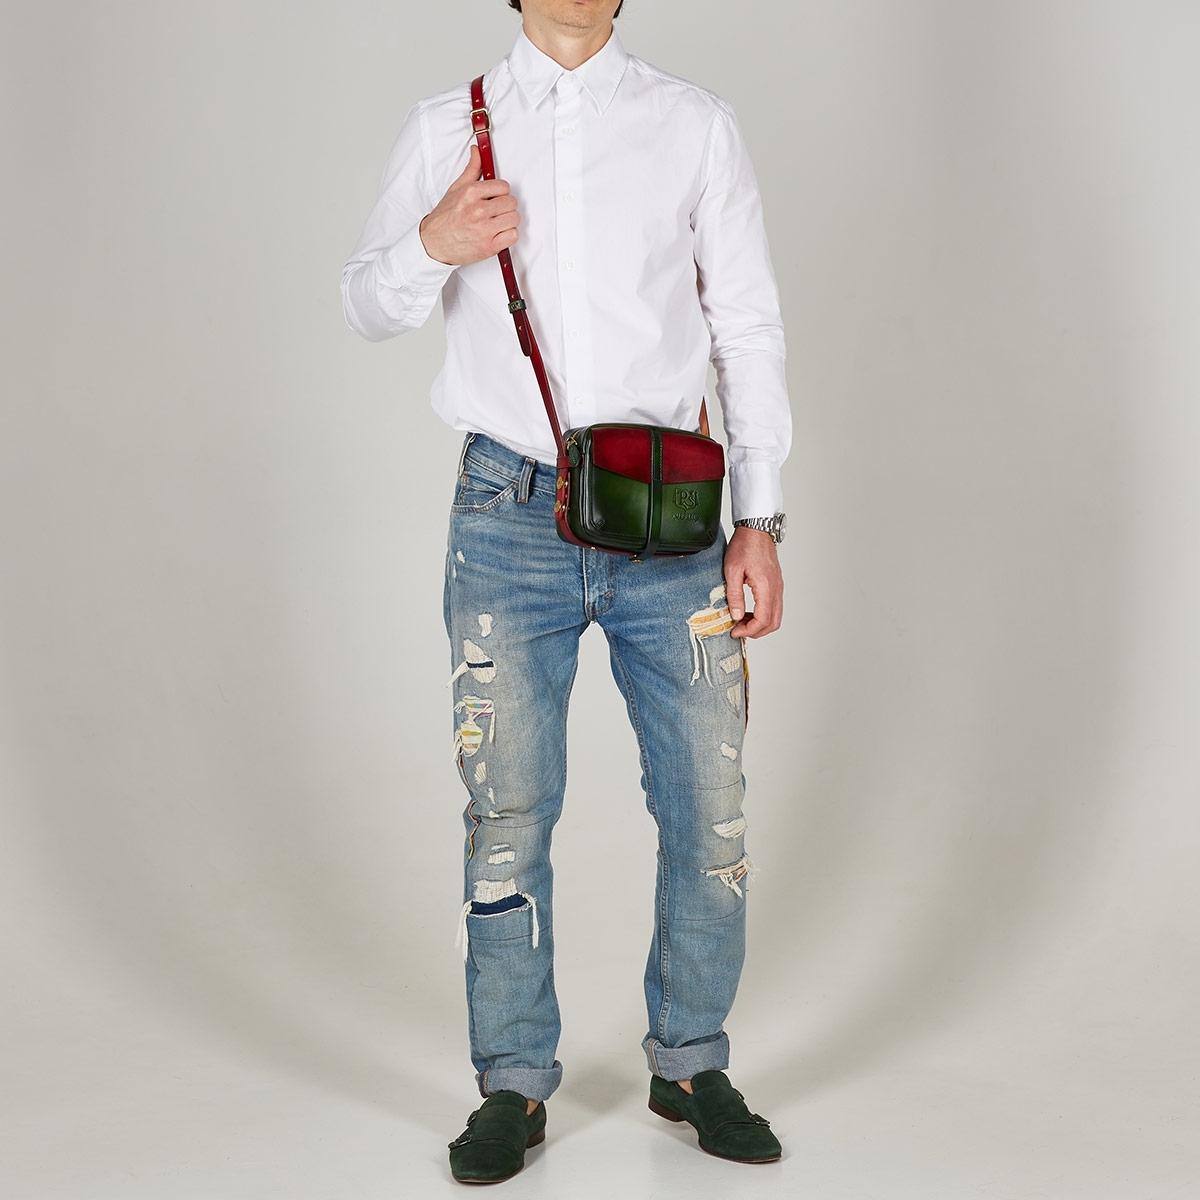 Smart crossbody bag - clutch PUFF red currant & grassy green